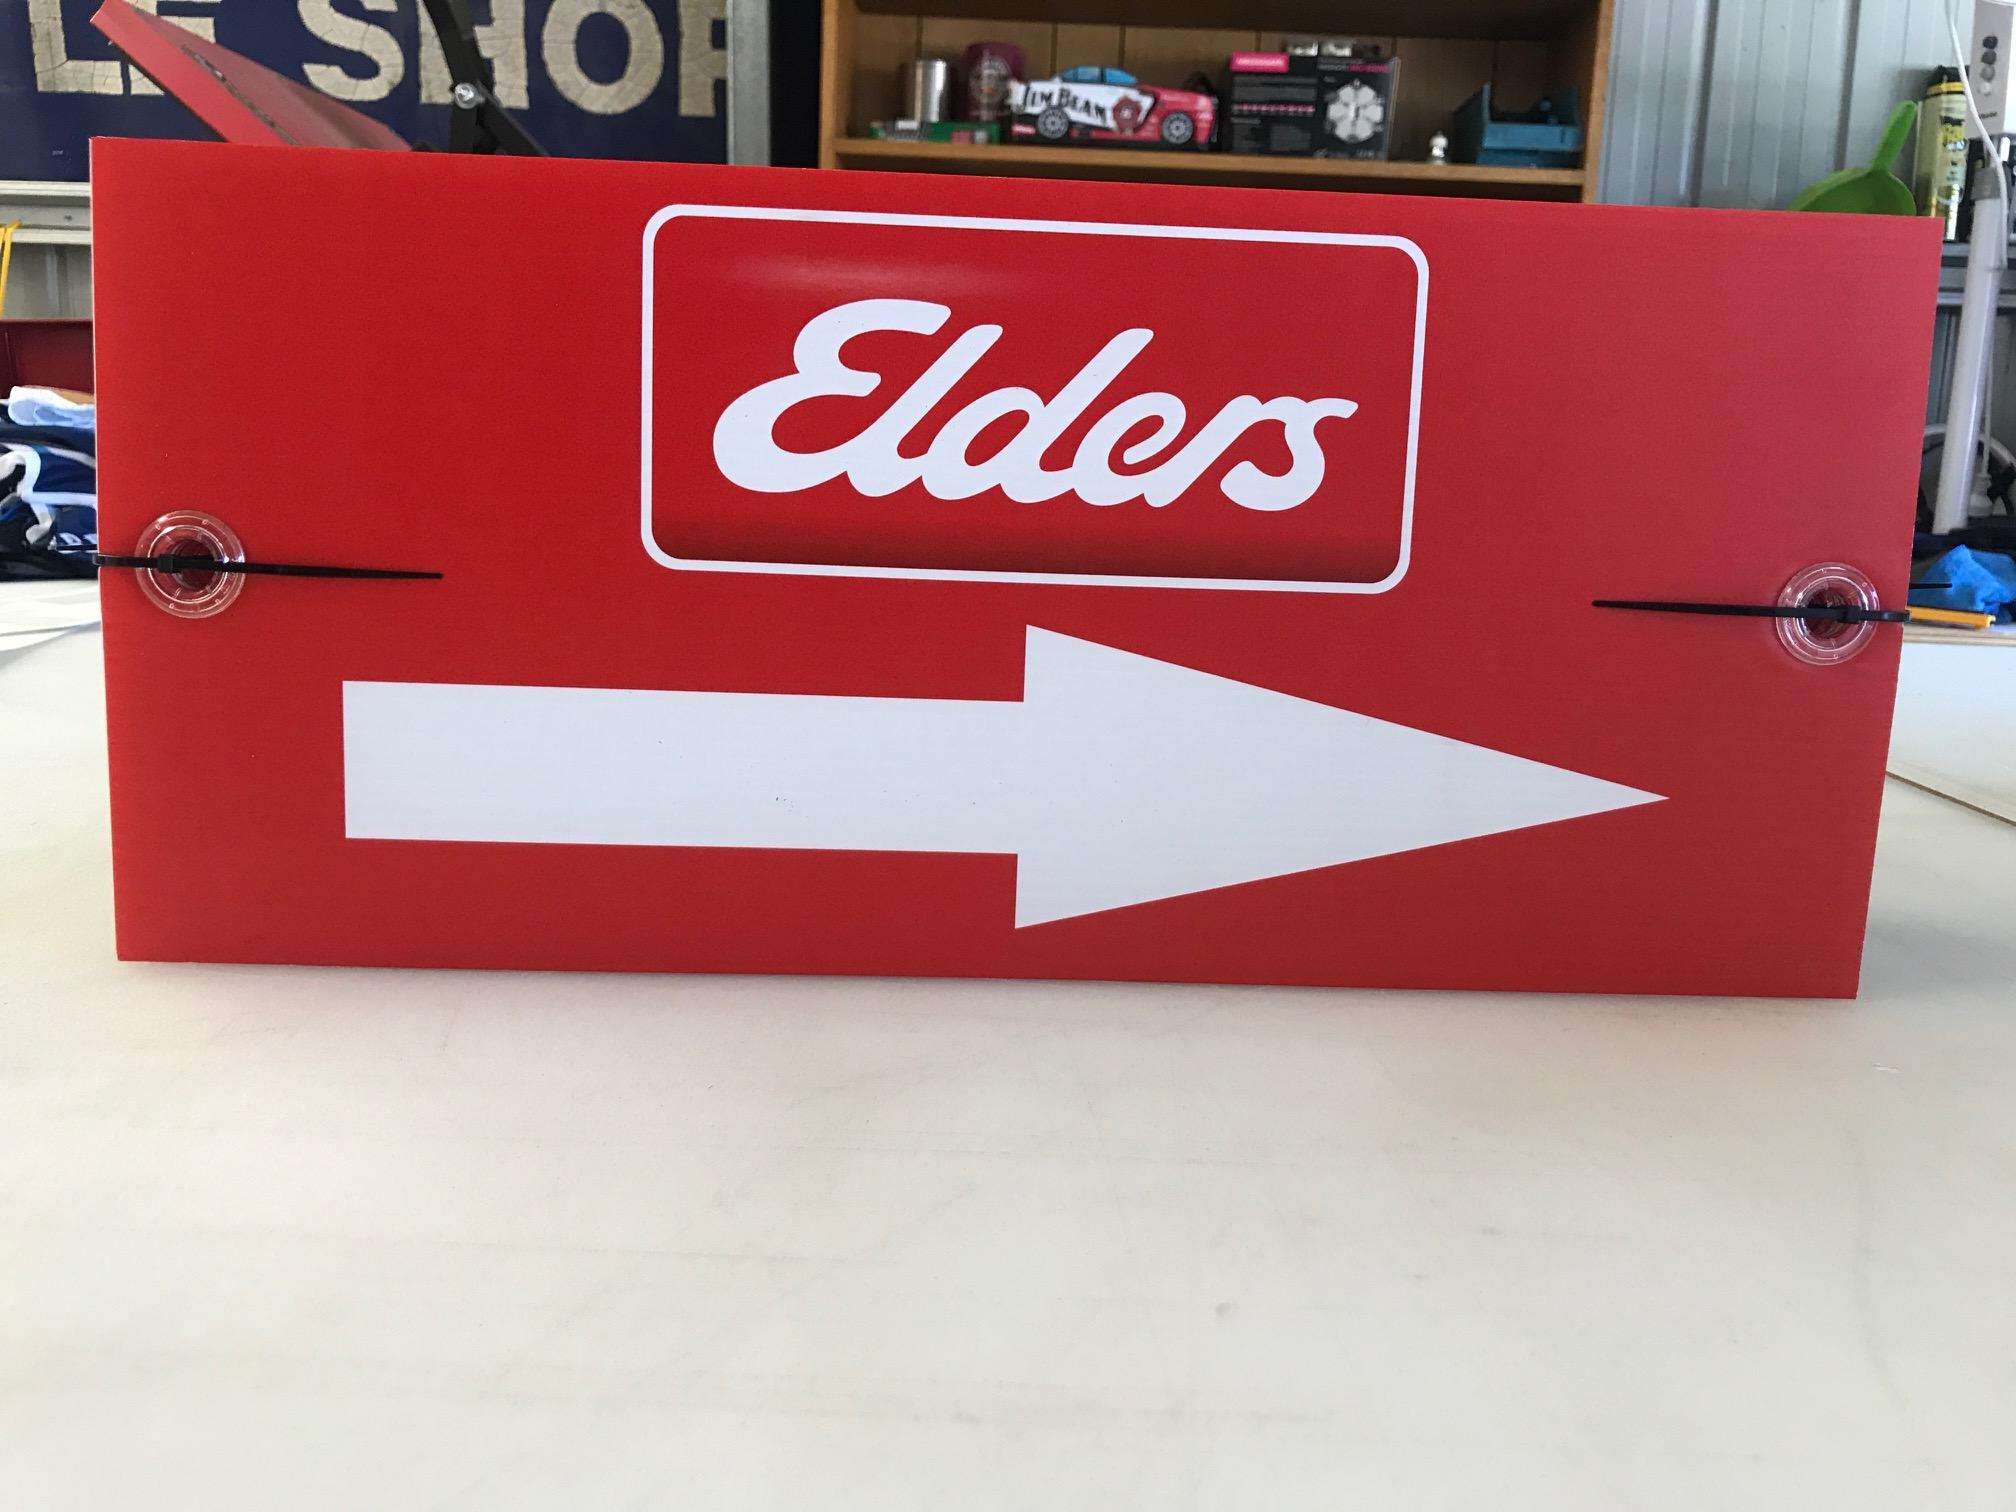 Elder Real Estate Directional Arrows